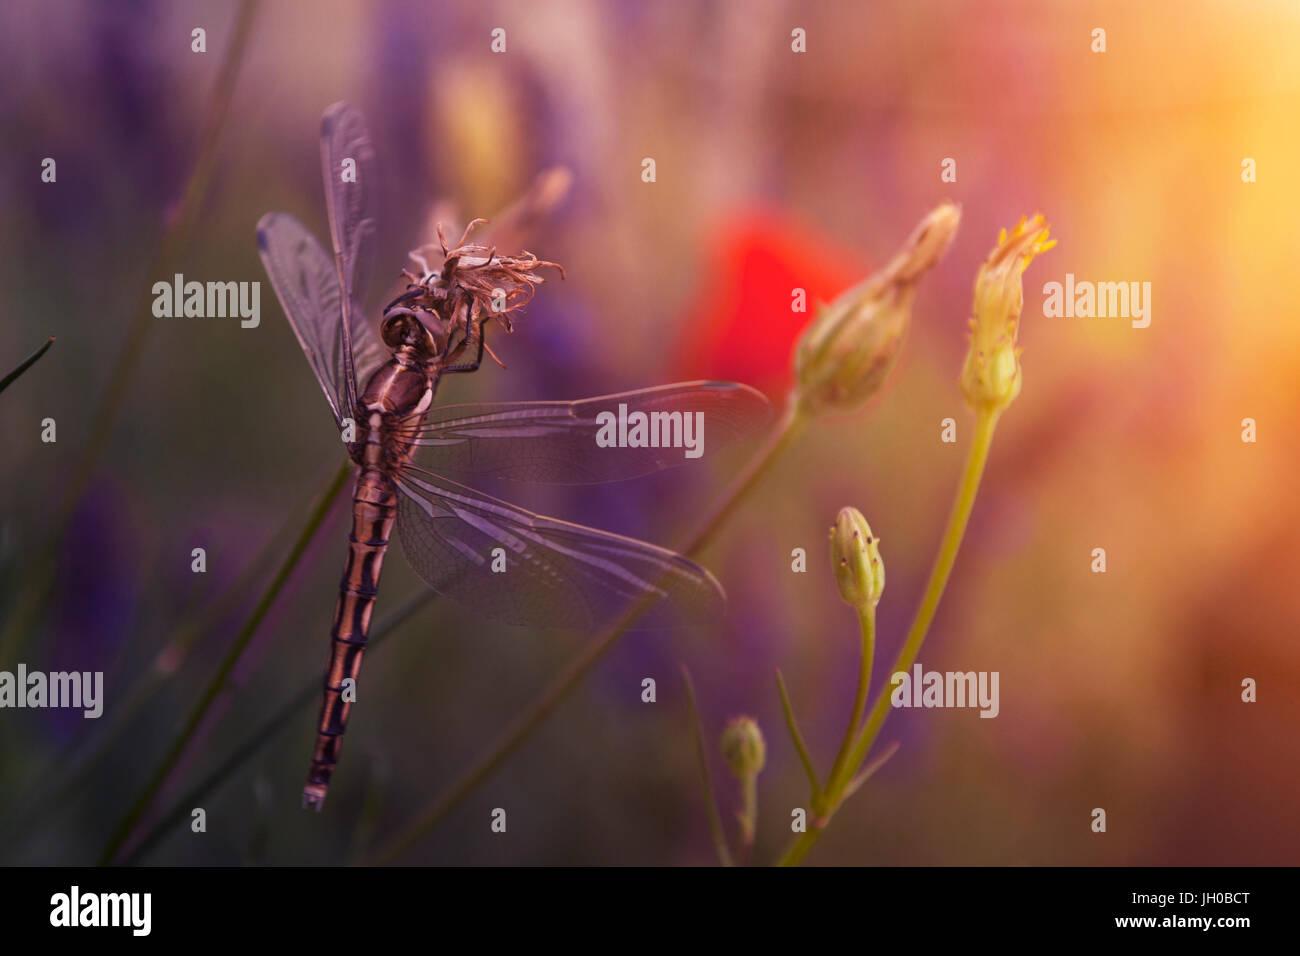 Dragonfly on flower in summer sunset - Stock Image